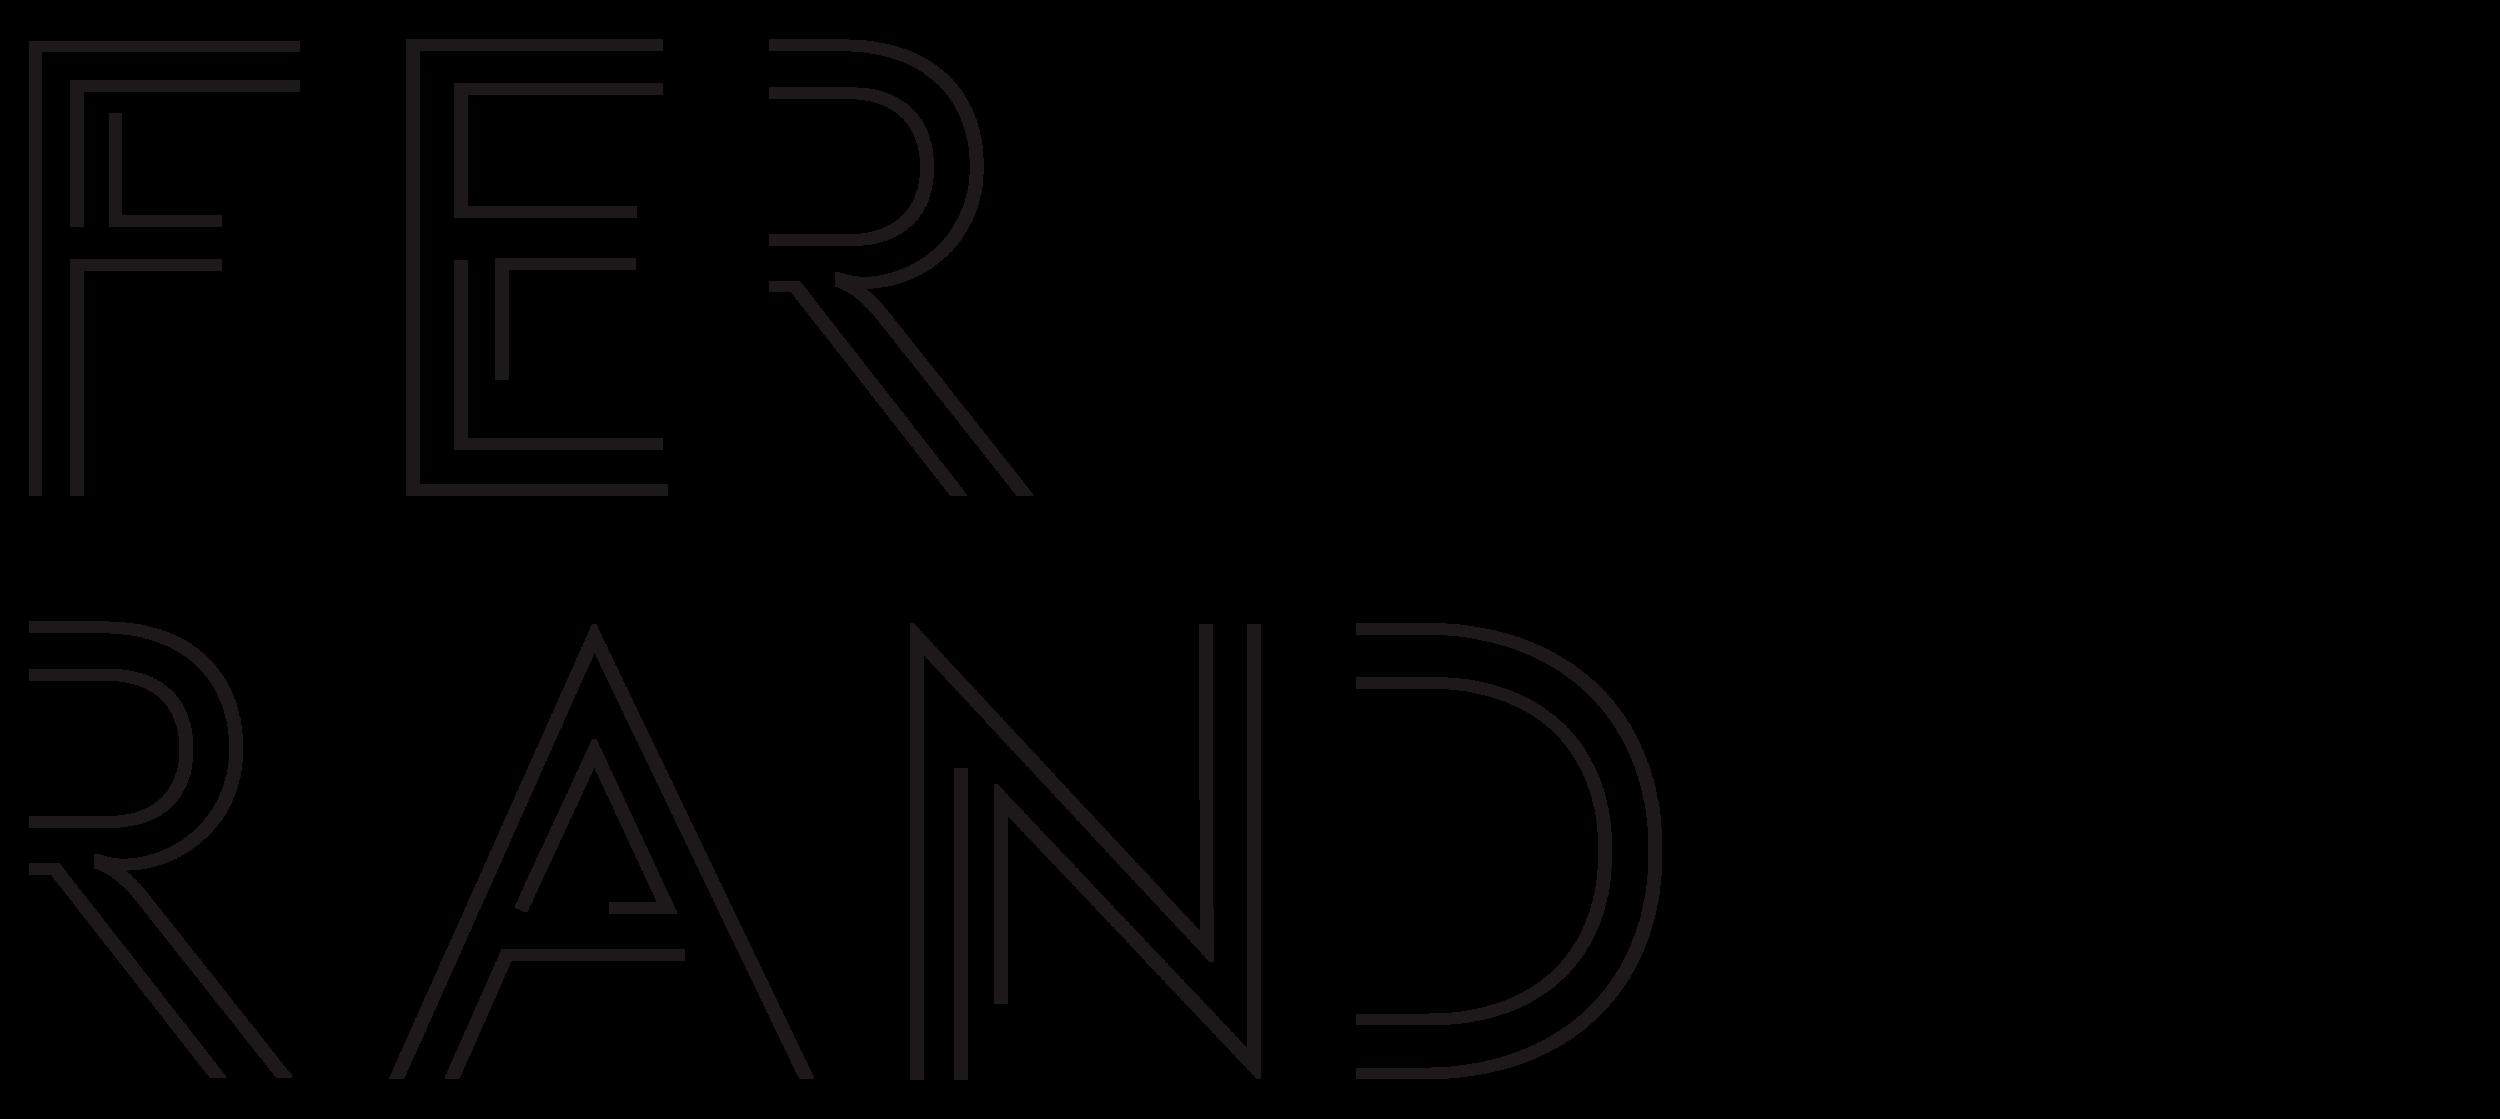 ferrand_primary logo2_chrcoal_pl2_black_pl2_black.png